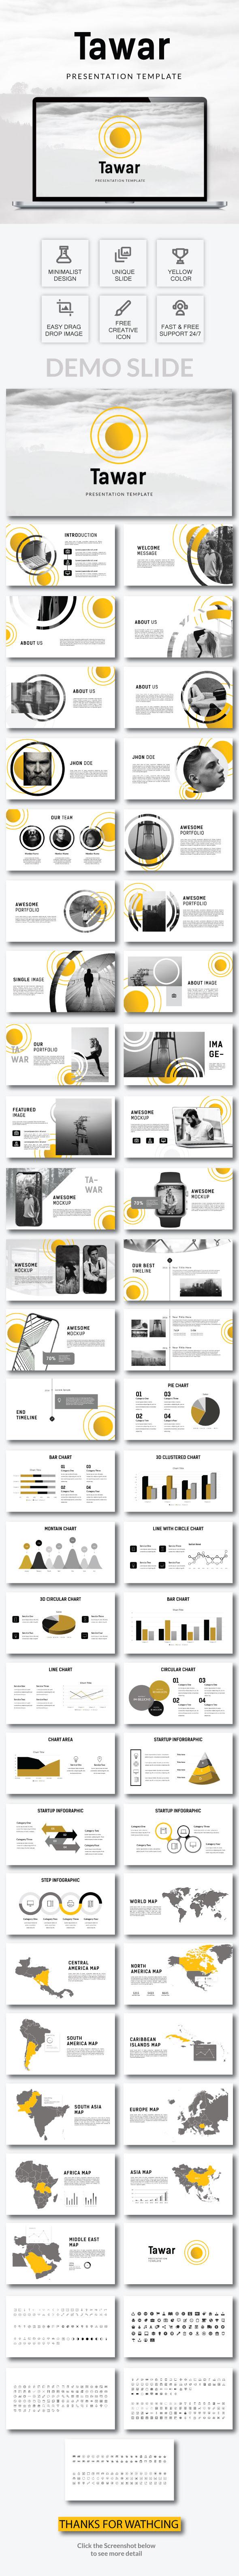 Tawar - Powerpoint Template - PowerPoint Templates Presentation Templates